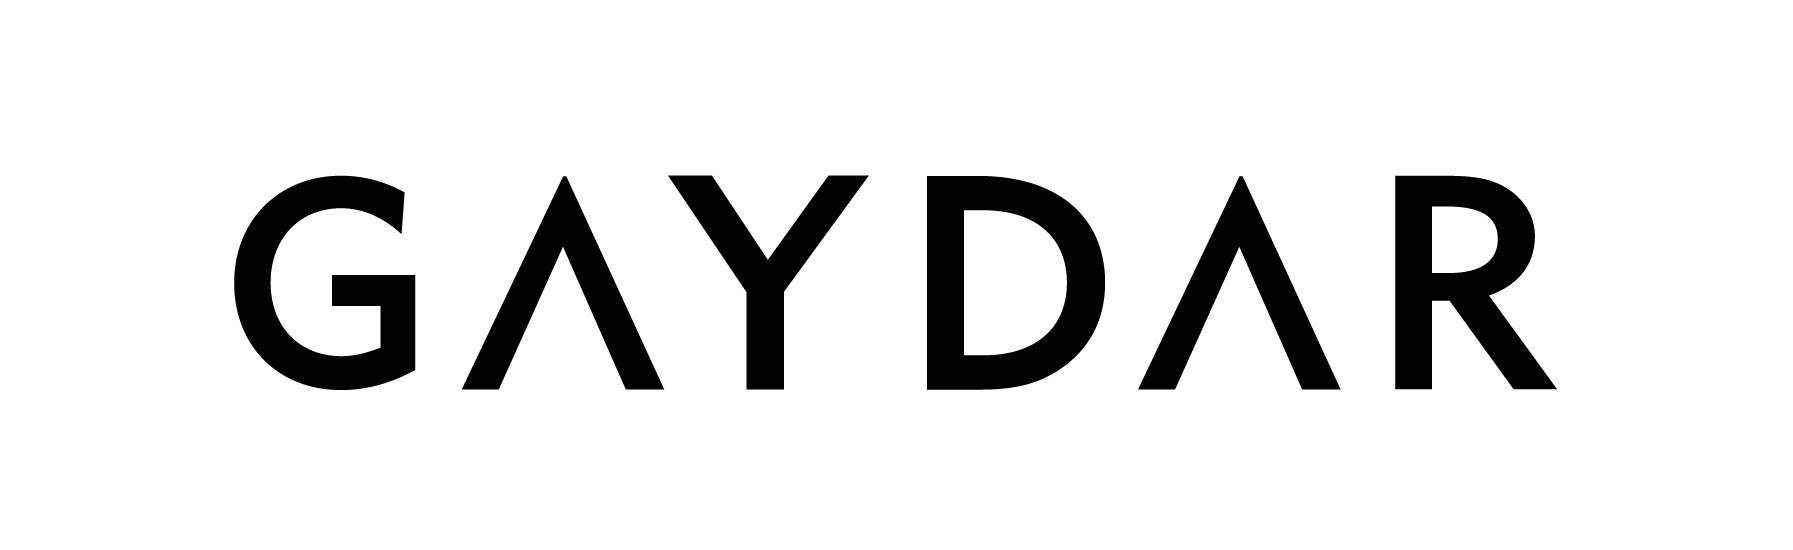 Gaydar global dating